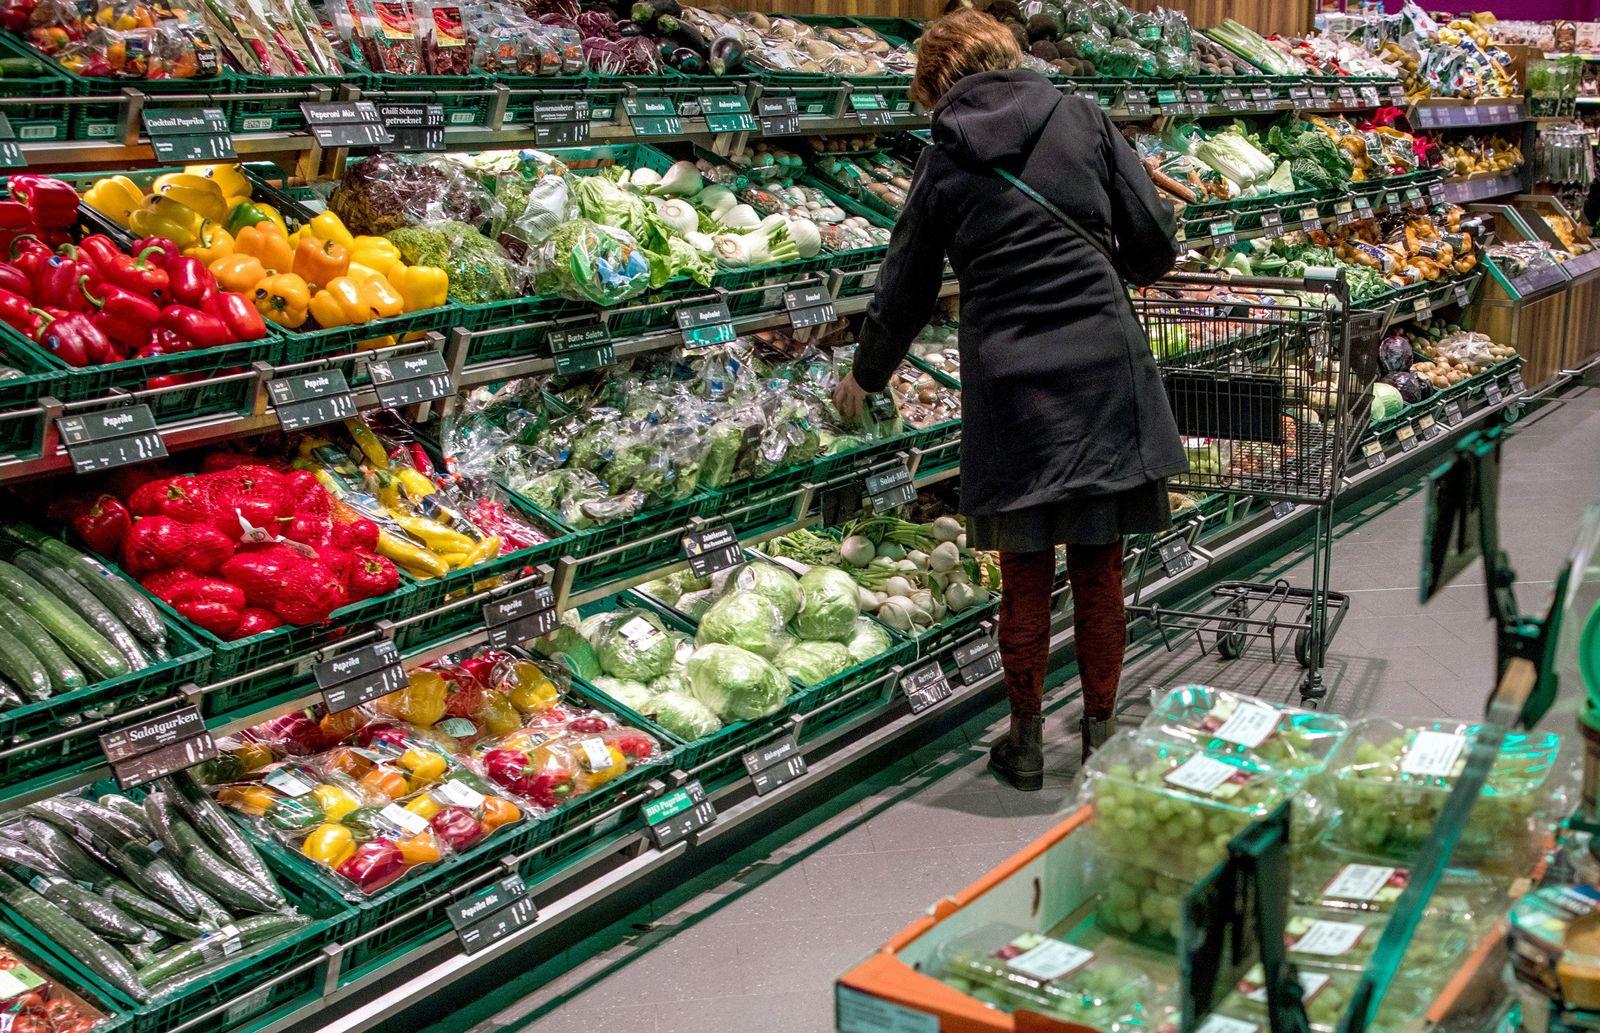 Lebensmittel im Supermarkt